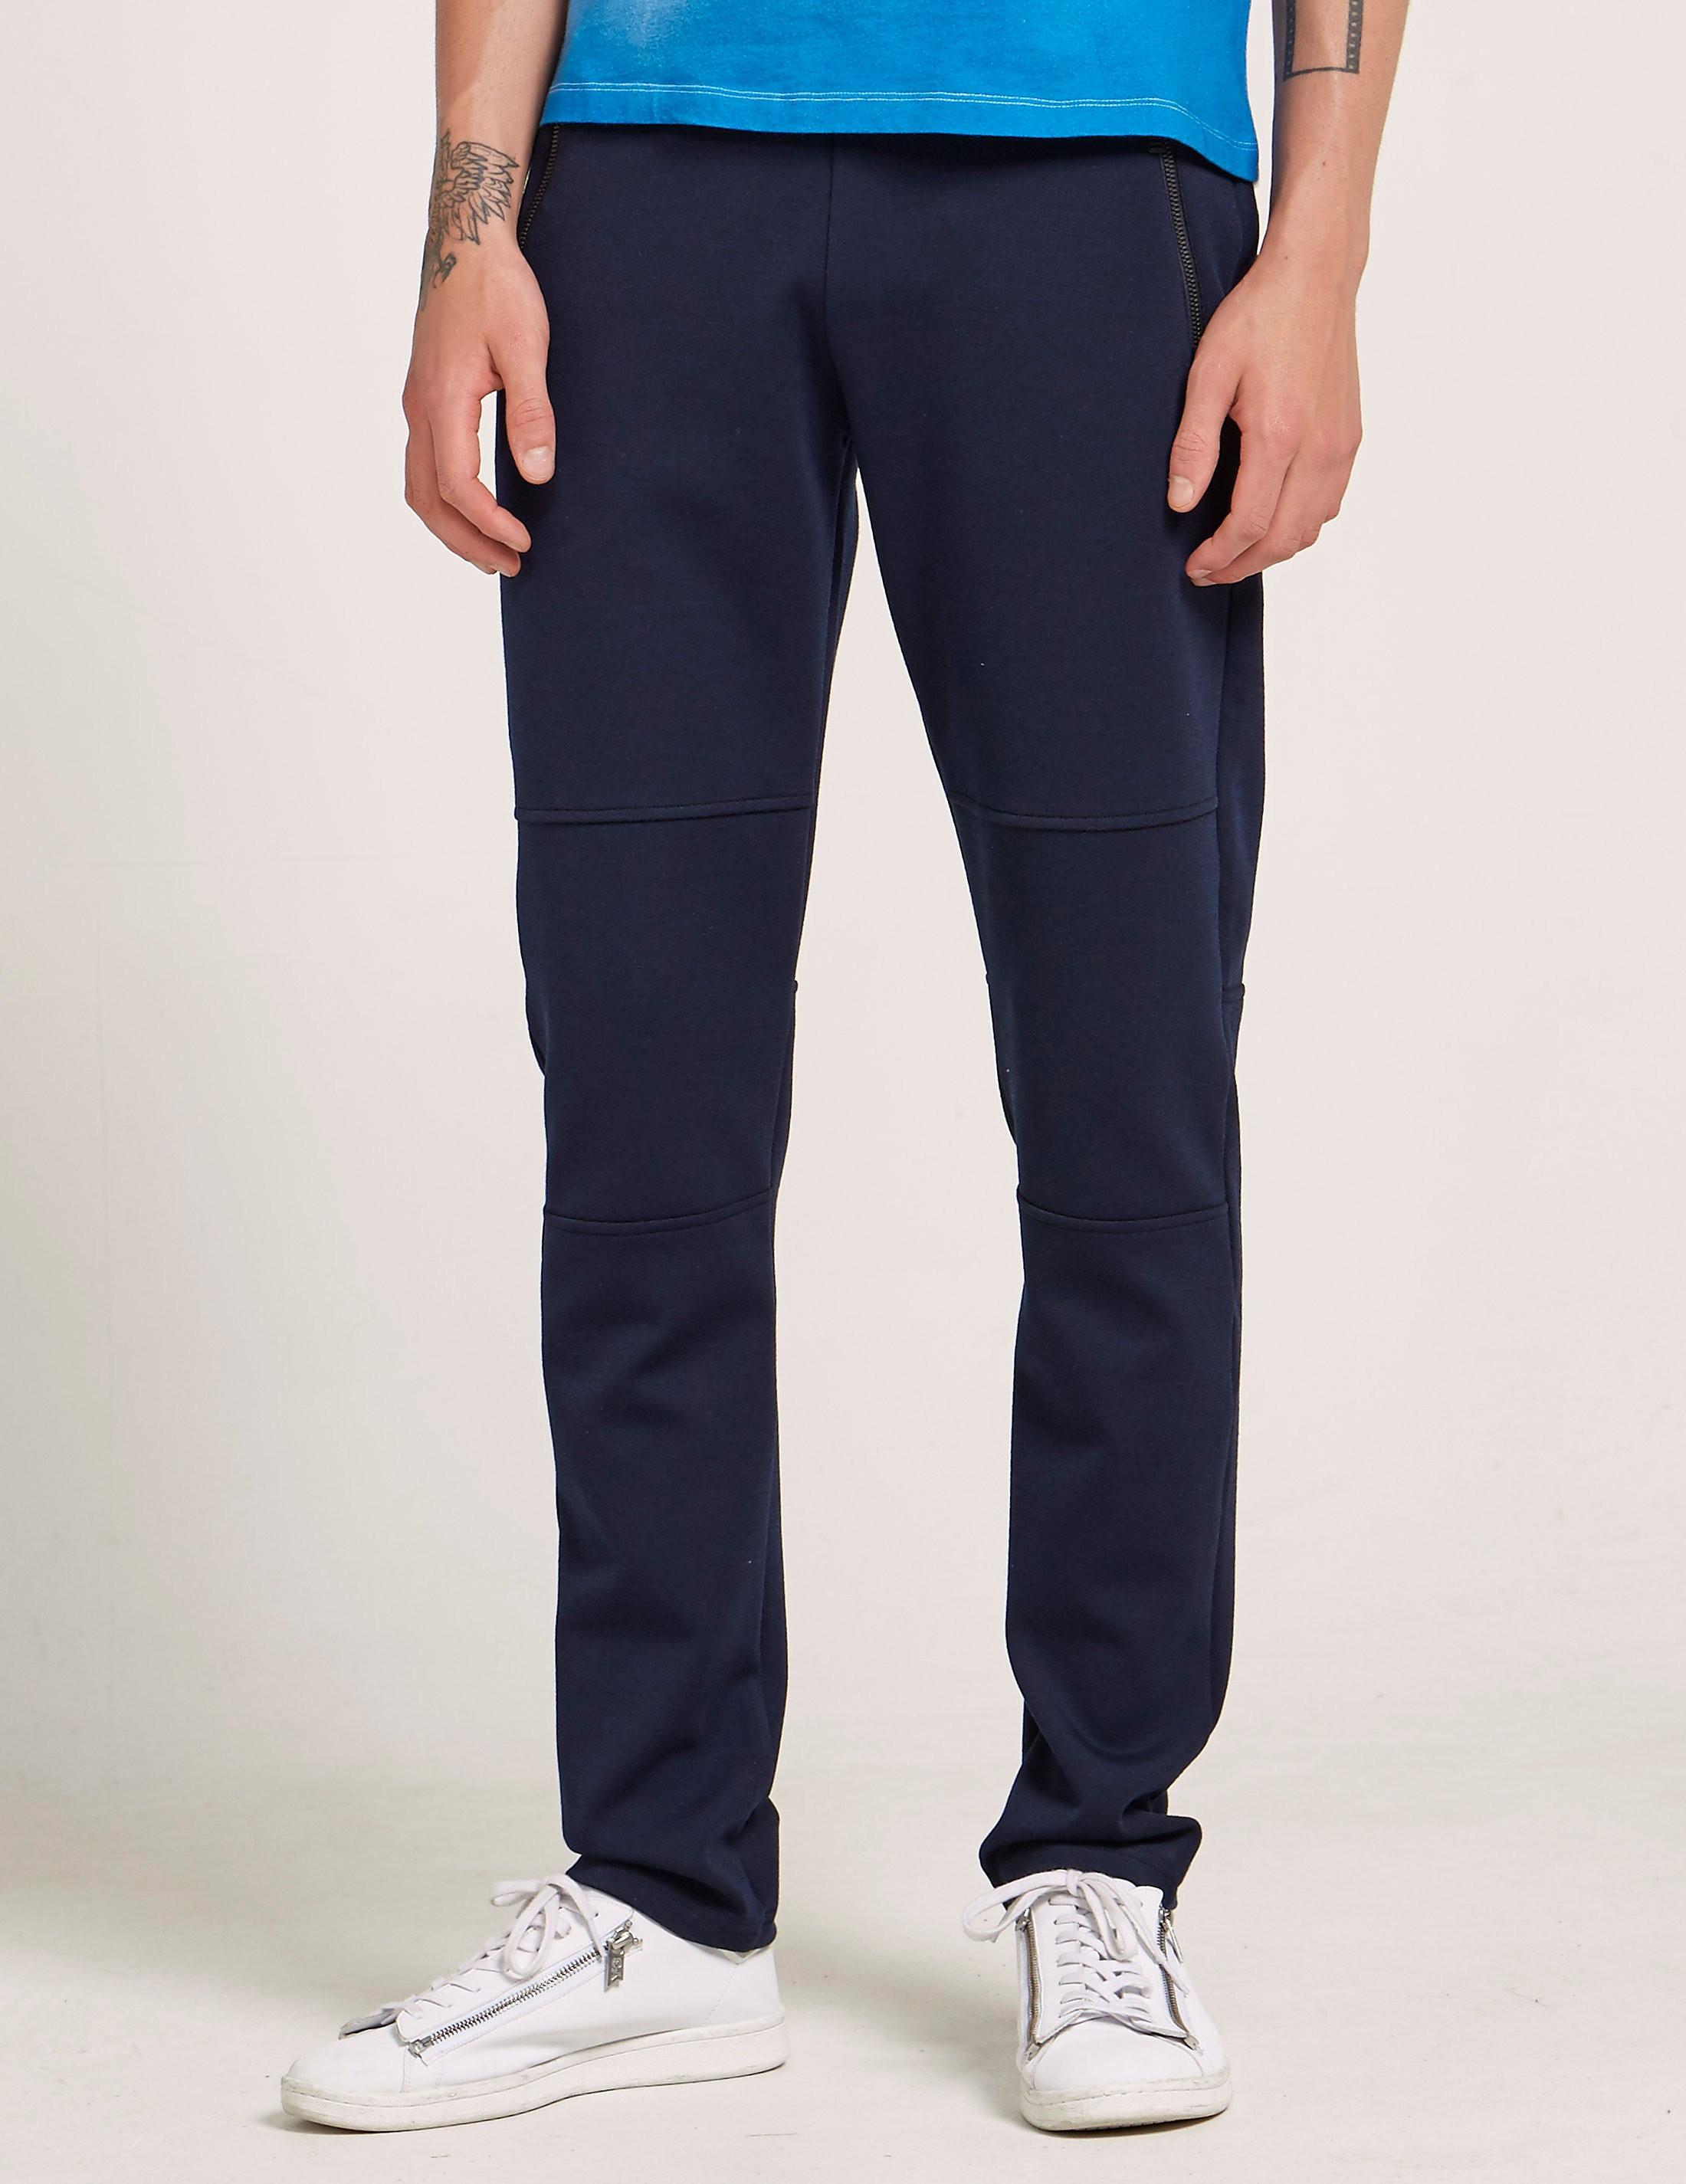 Fusalp Track Pants